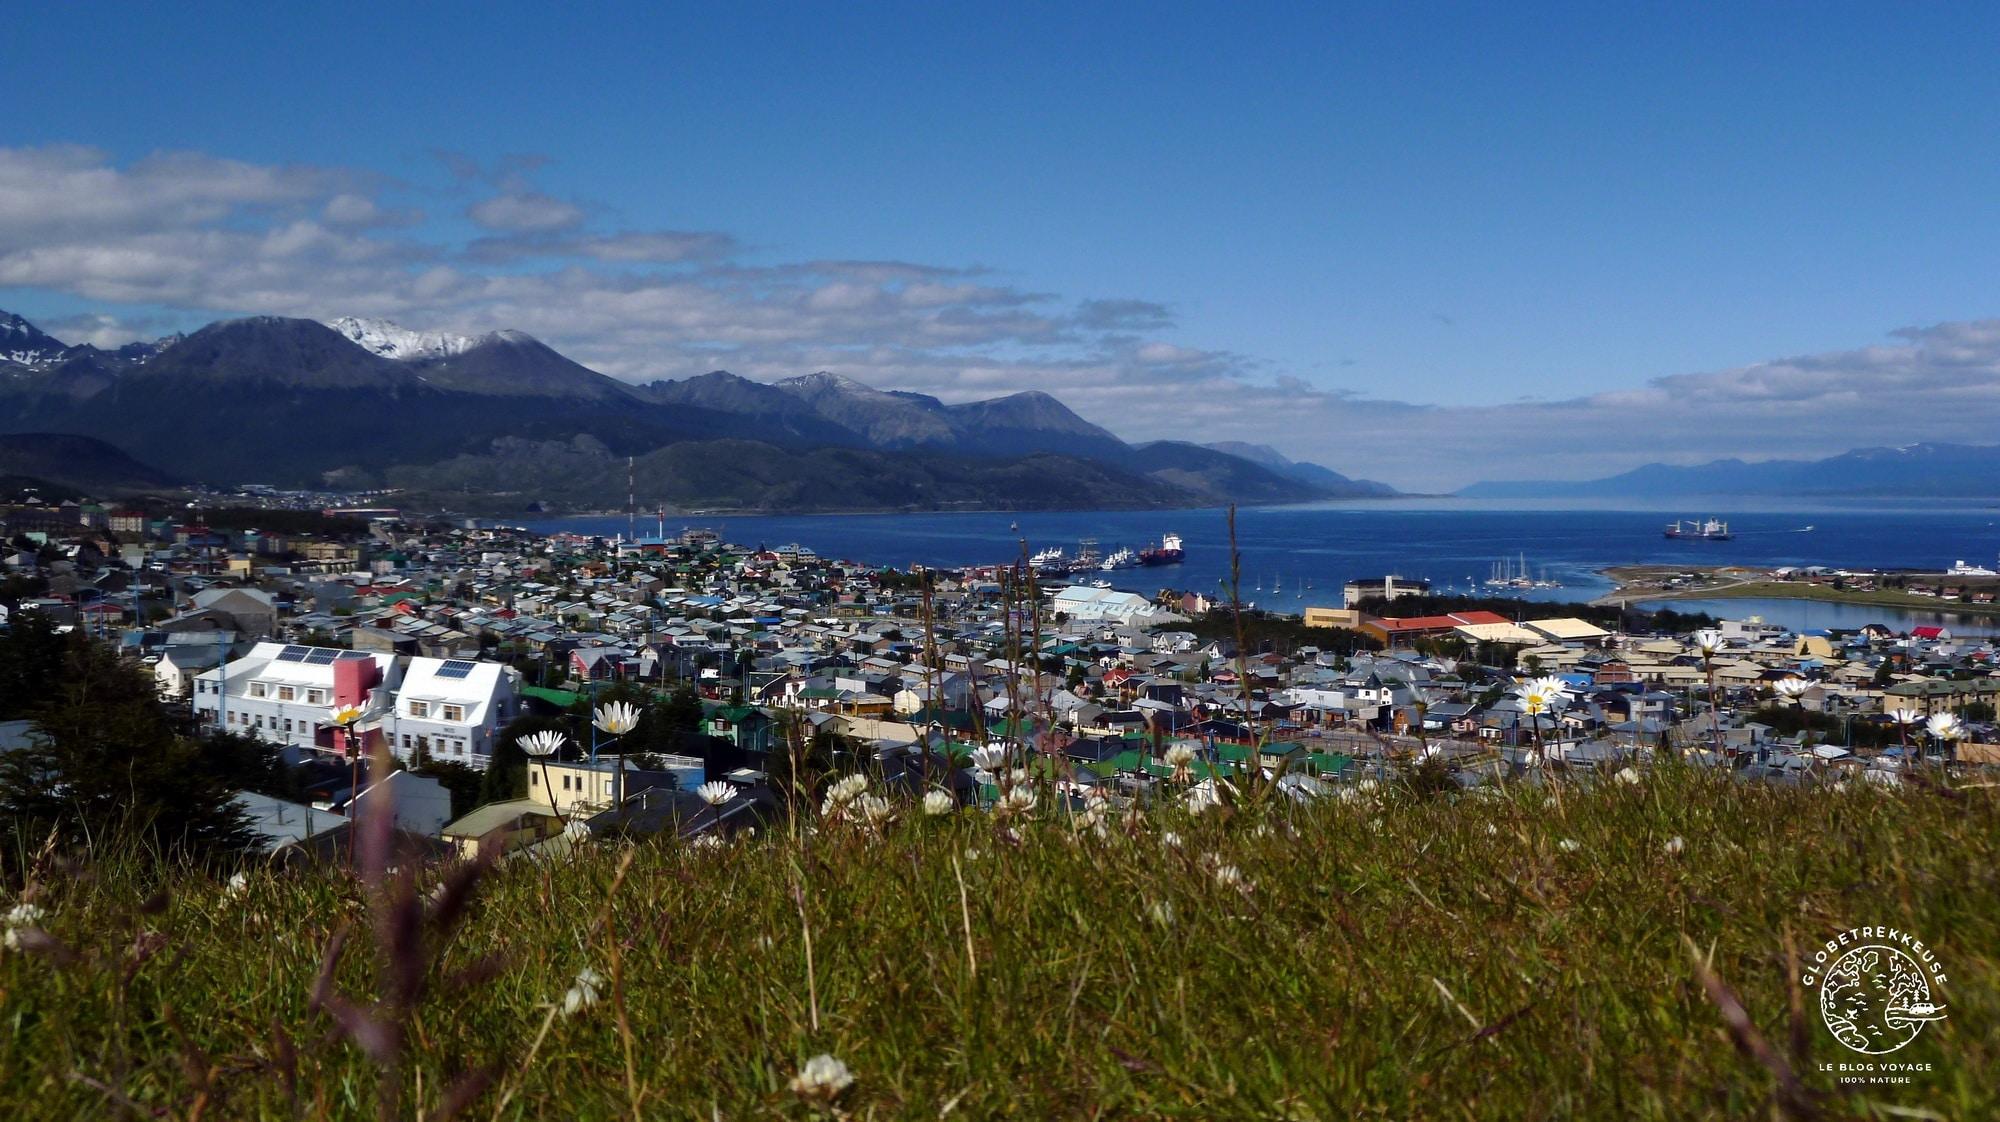 visiter la patagonie ushuaia globetrekkeuse